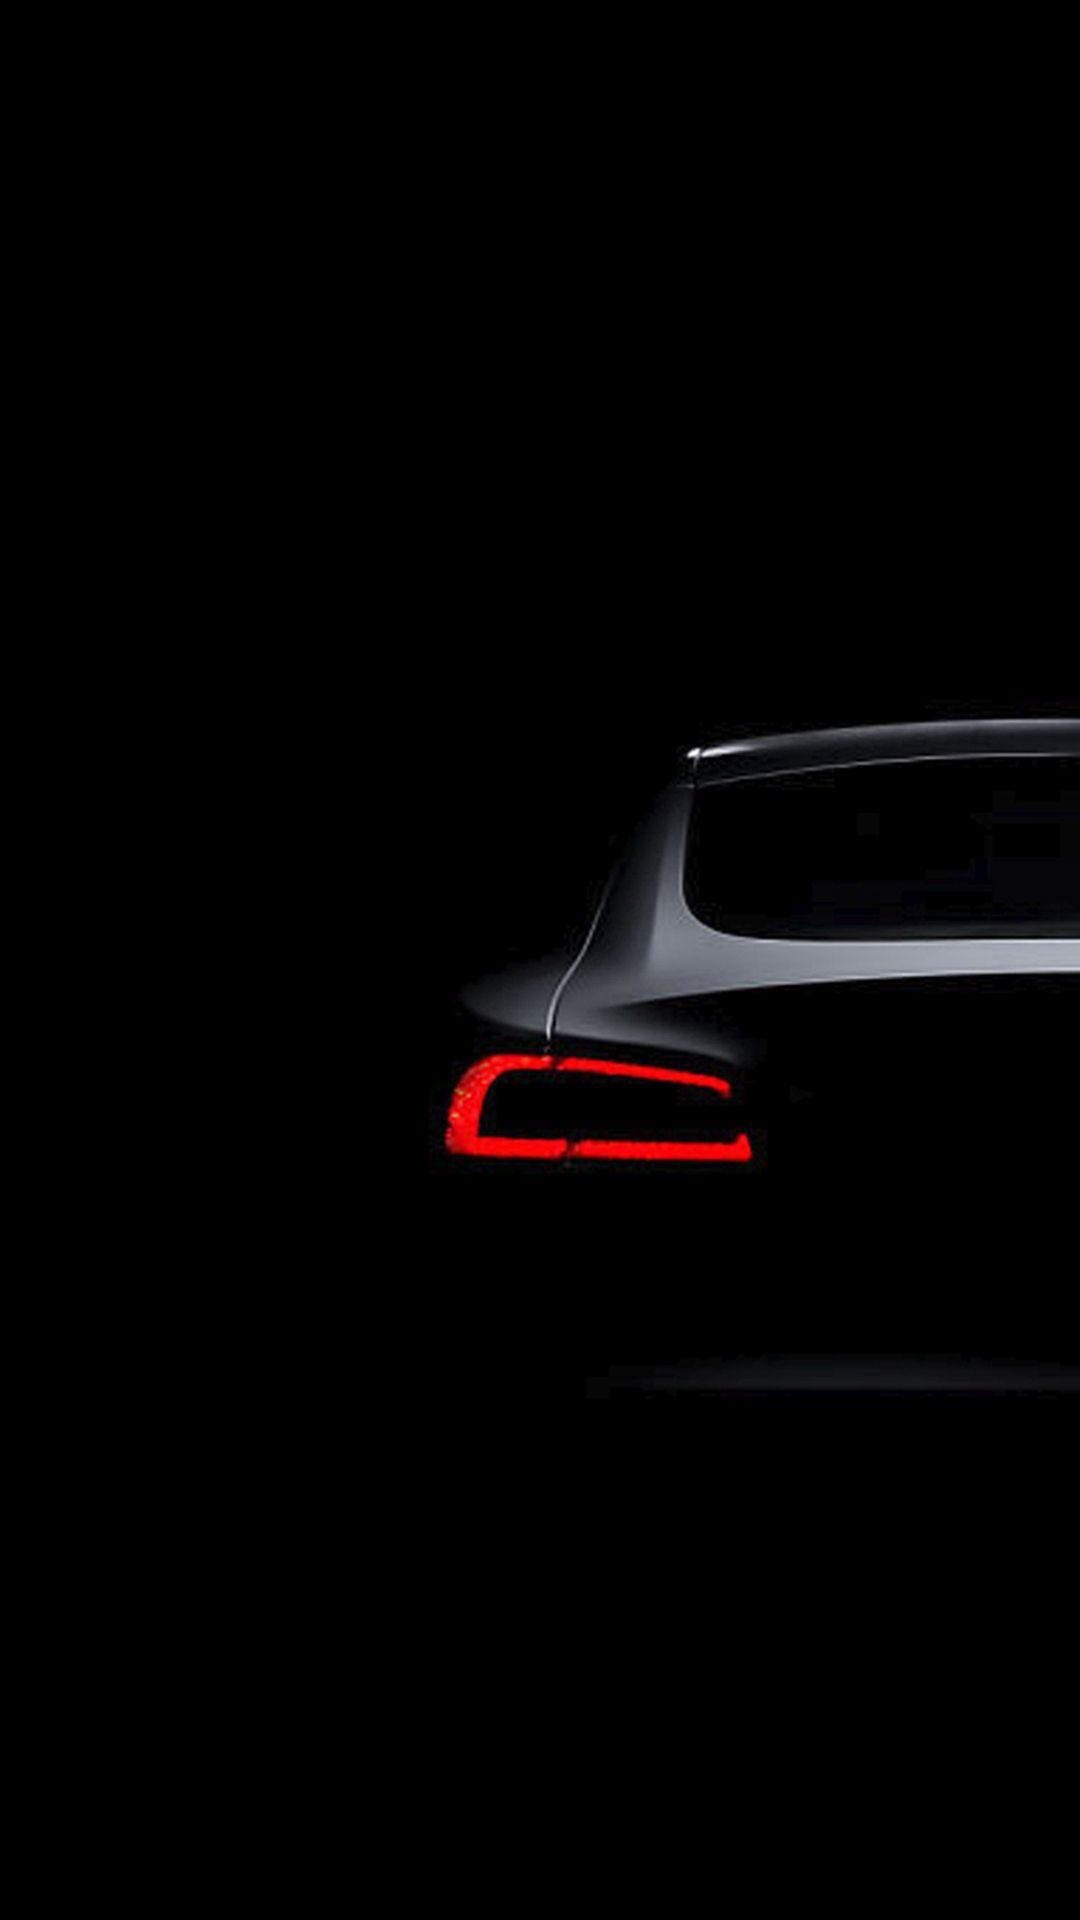 Tesla Model S Dark Brake Light iPhone 6 wallpaper